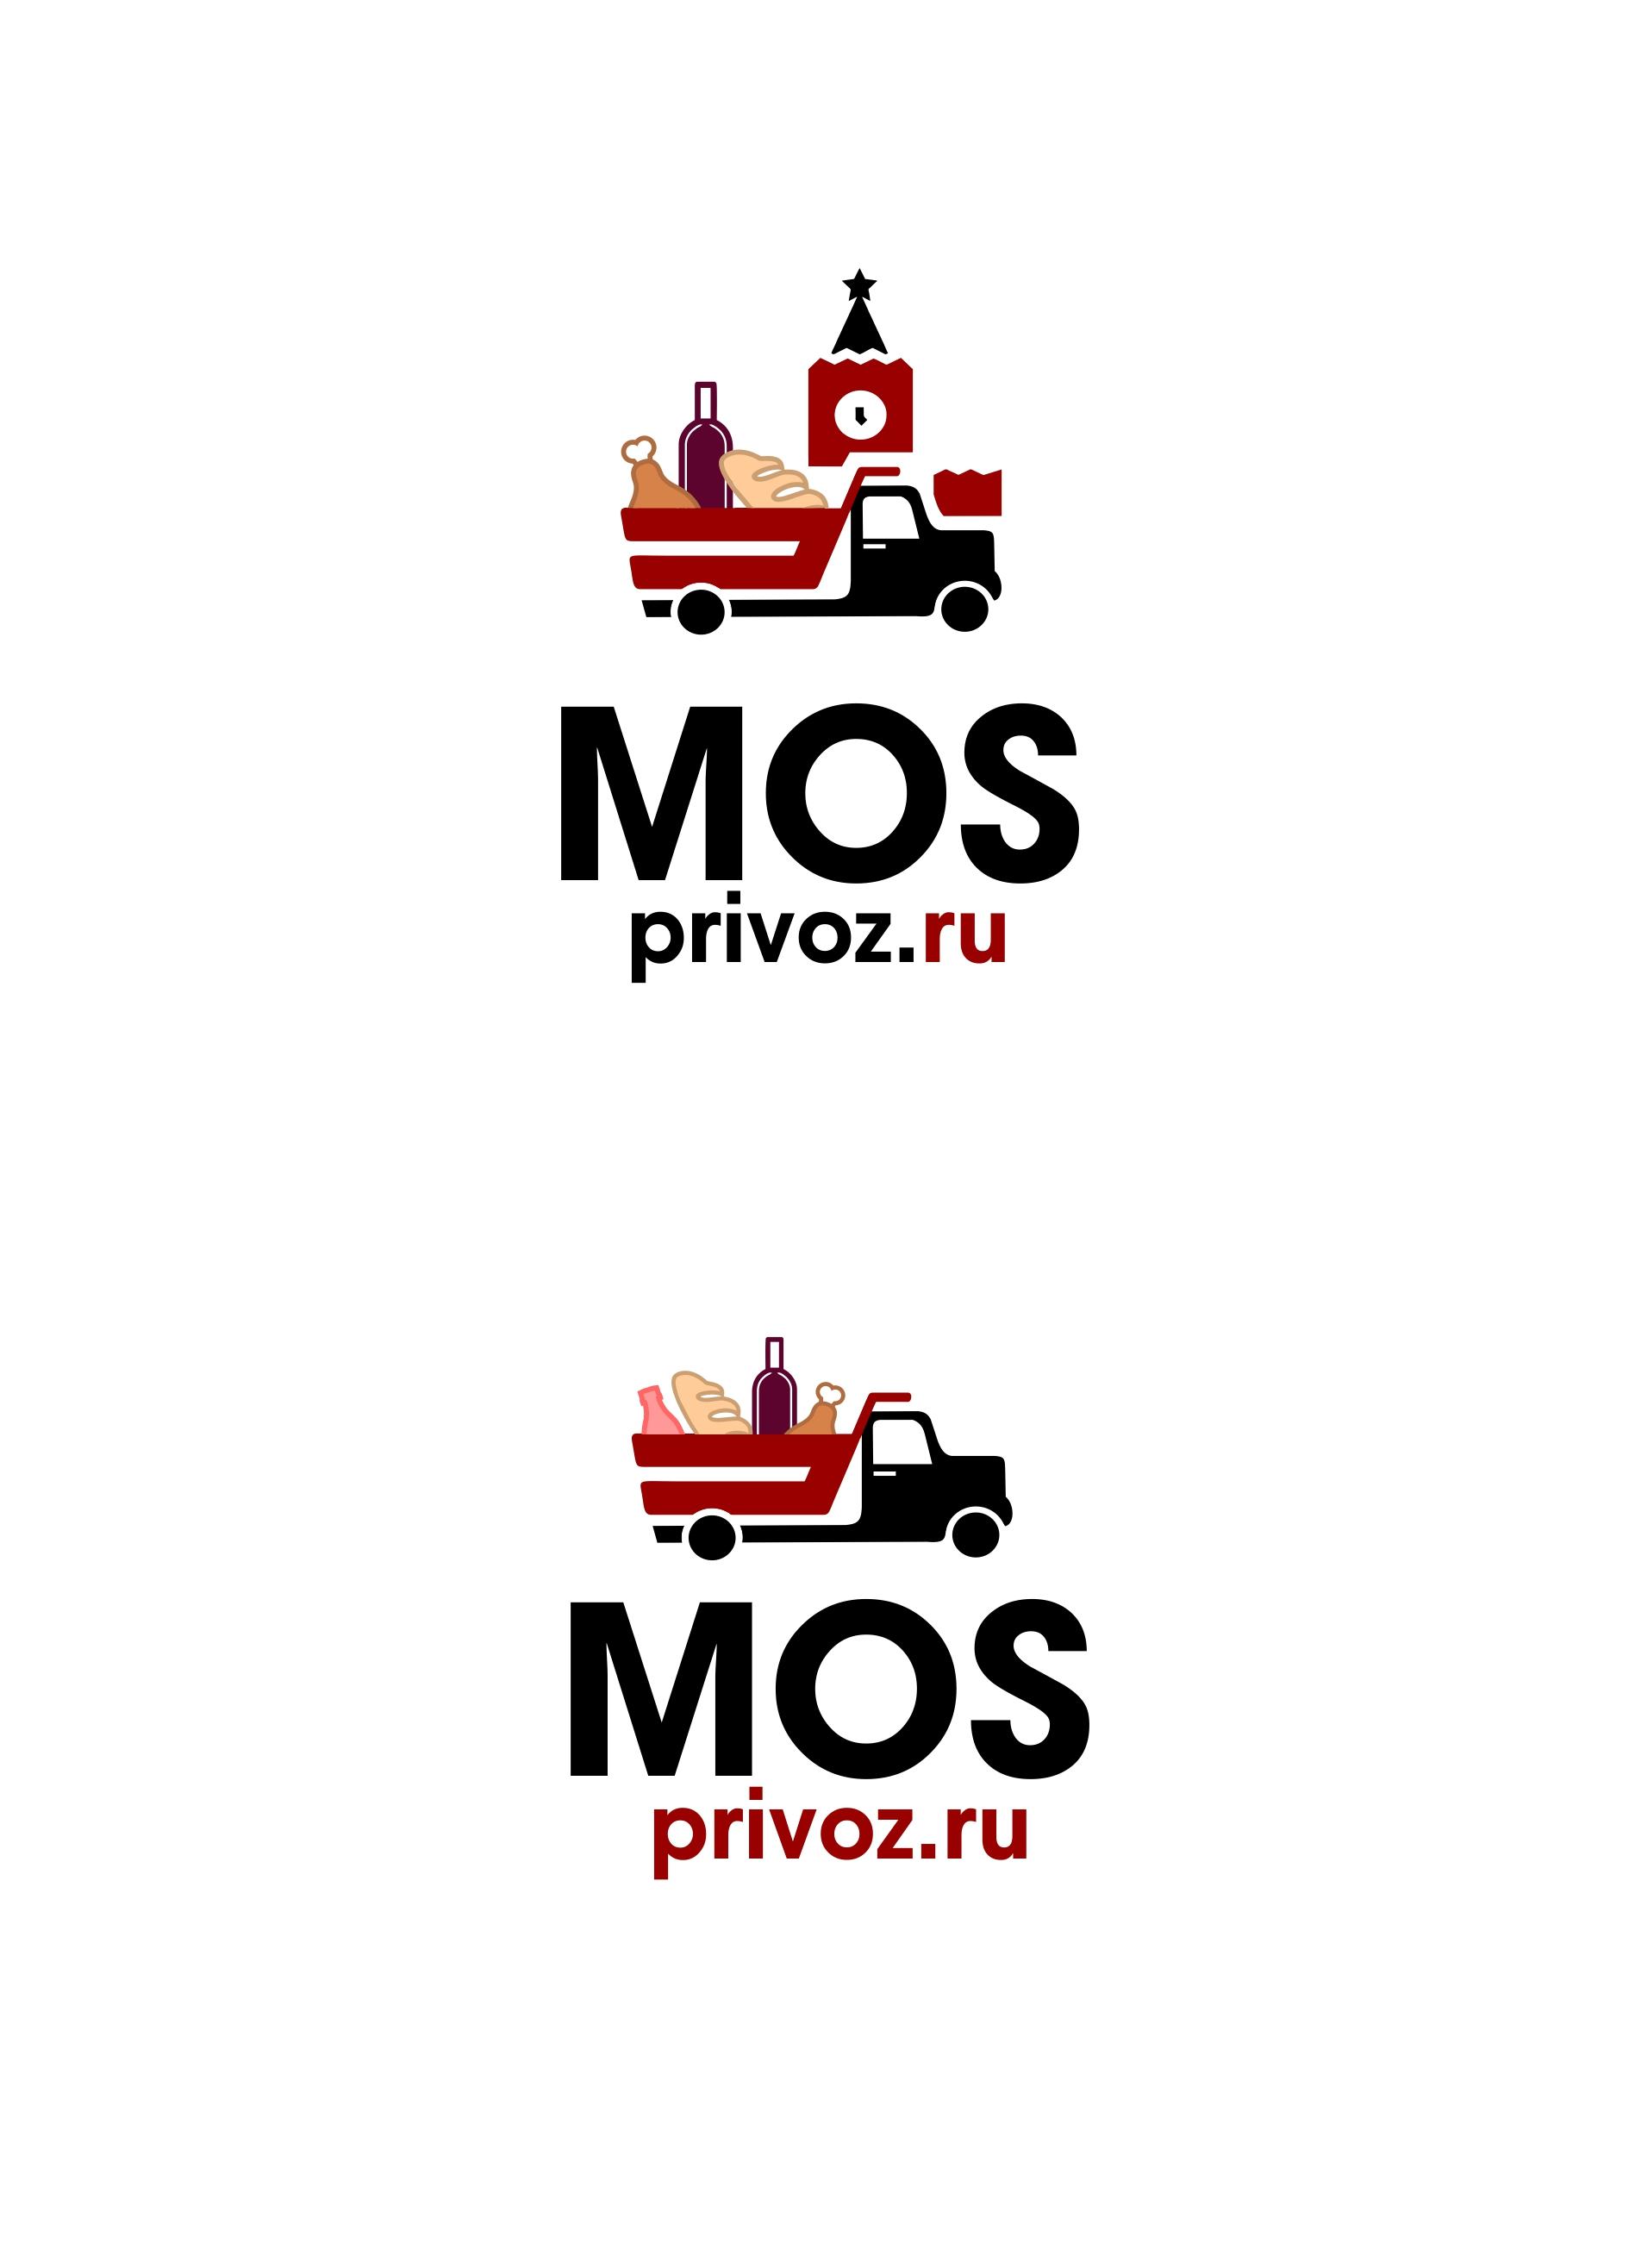 Логотип. Интернет - магазин по доставке продуктов питания. фото f_1495ad878cd5ddfa.jpg